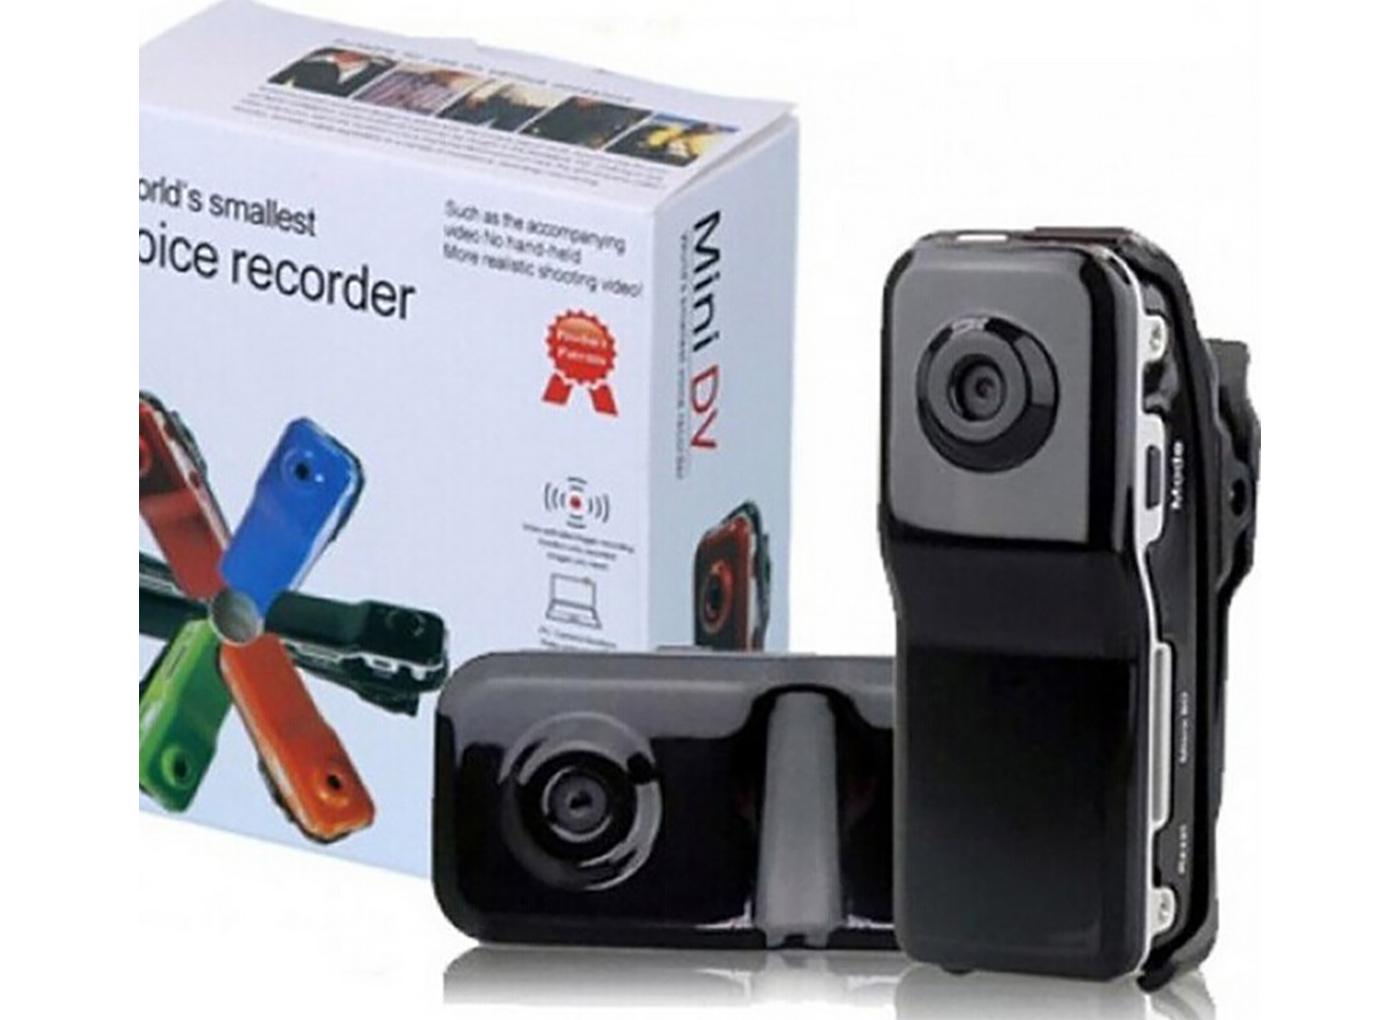 3WAY 超小型ビデオカメラ 2個セット 防犯 録画 録音 記録 携帯 ボイスレコーダー モバイル カメラ